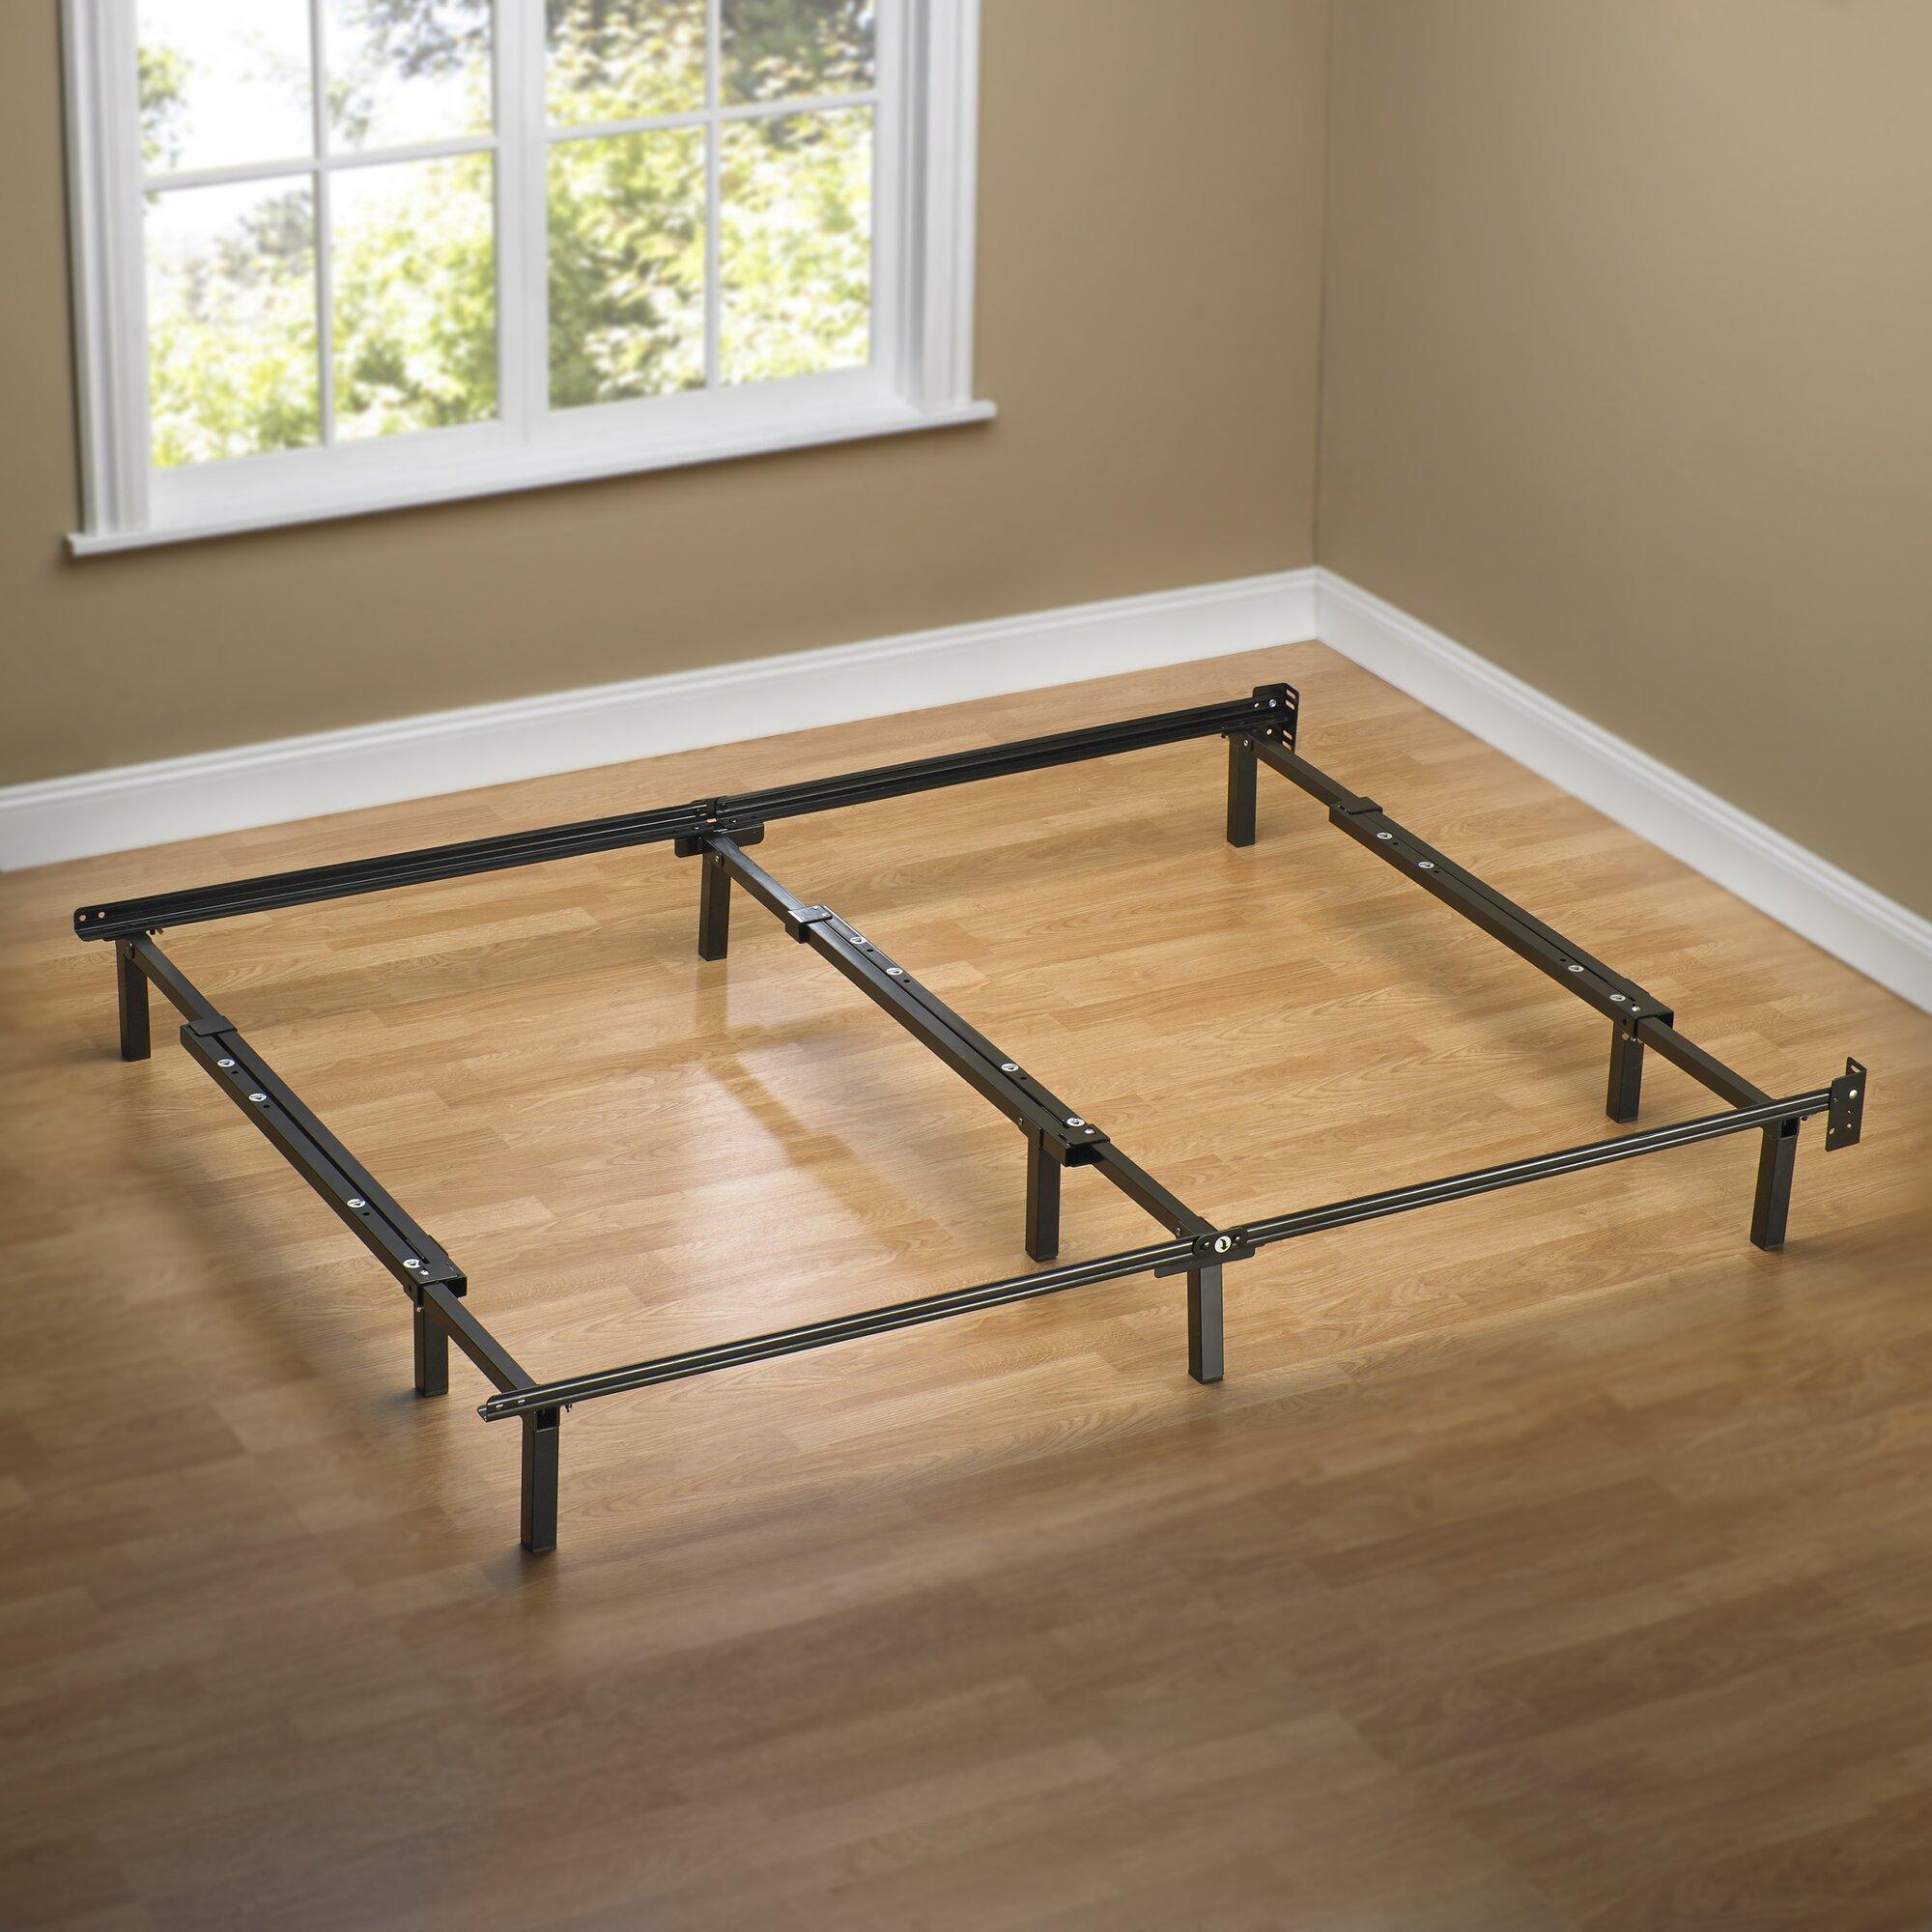 adjustable full to king size bed frame - Full Size Bed Frames